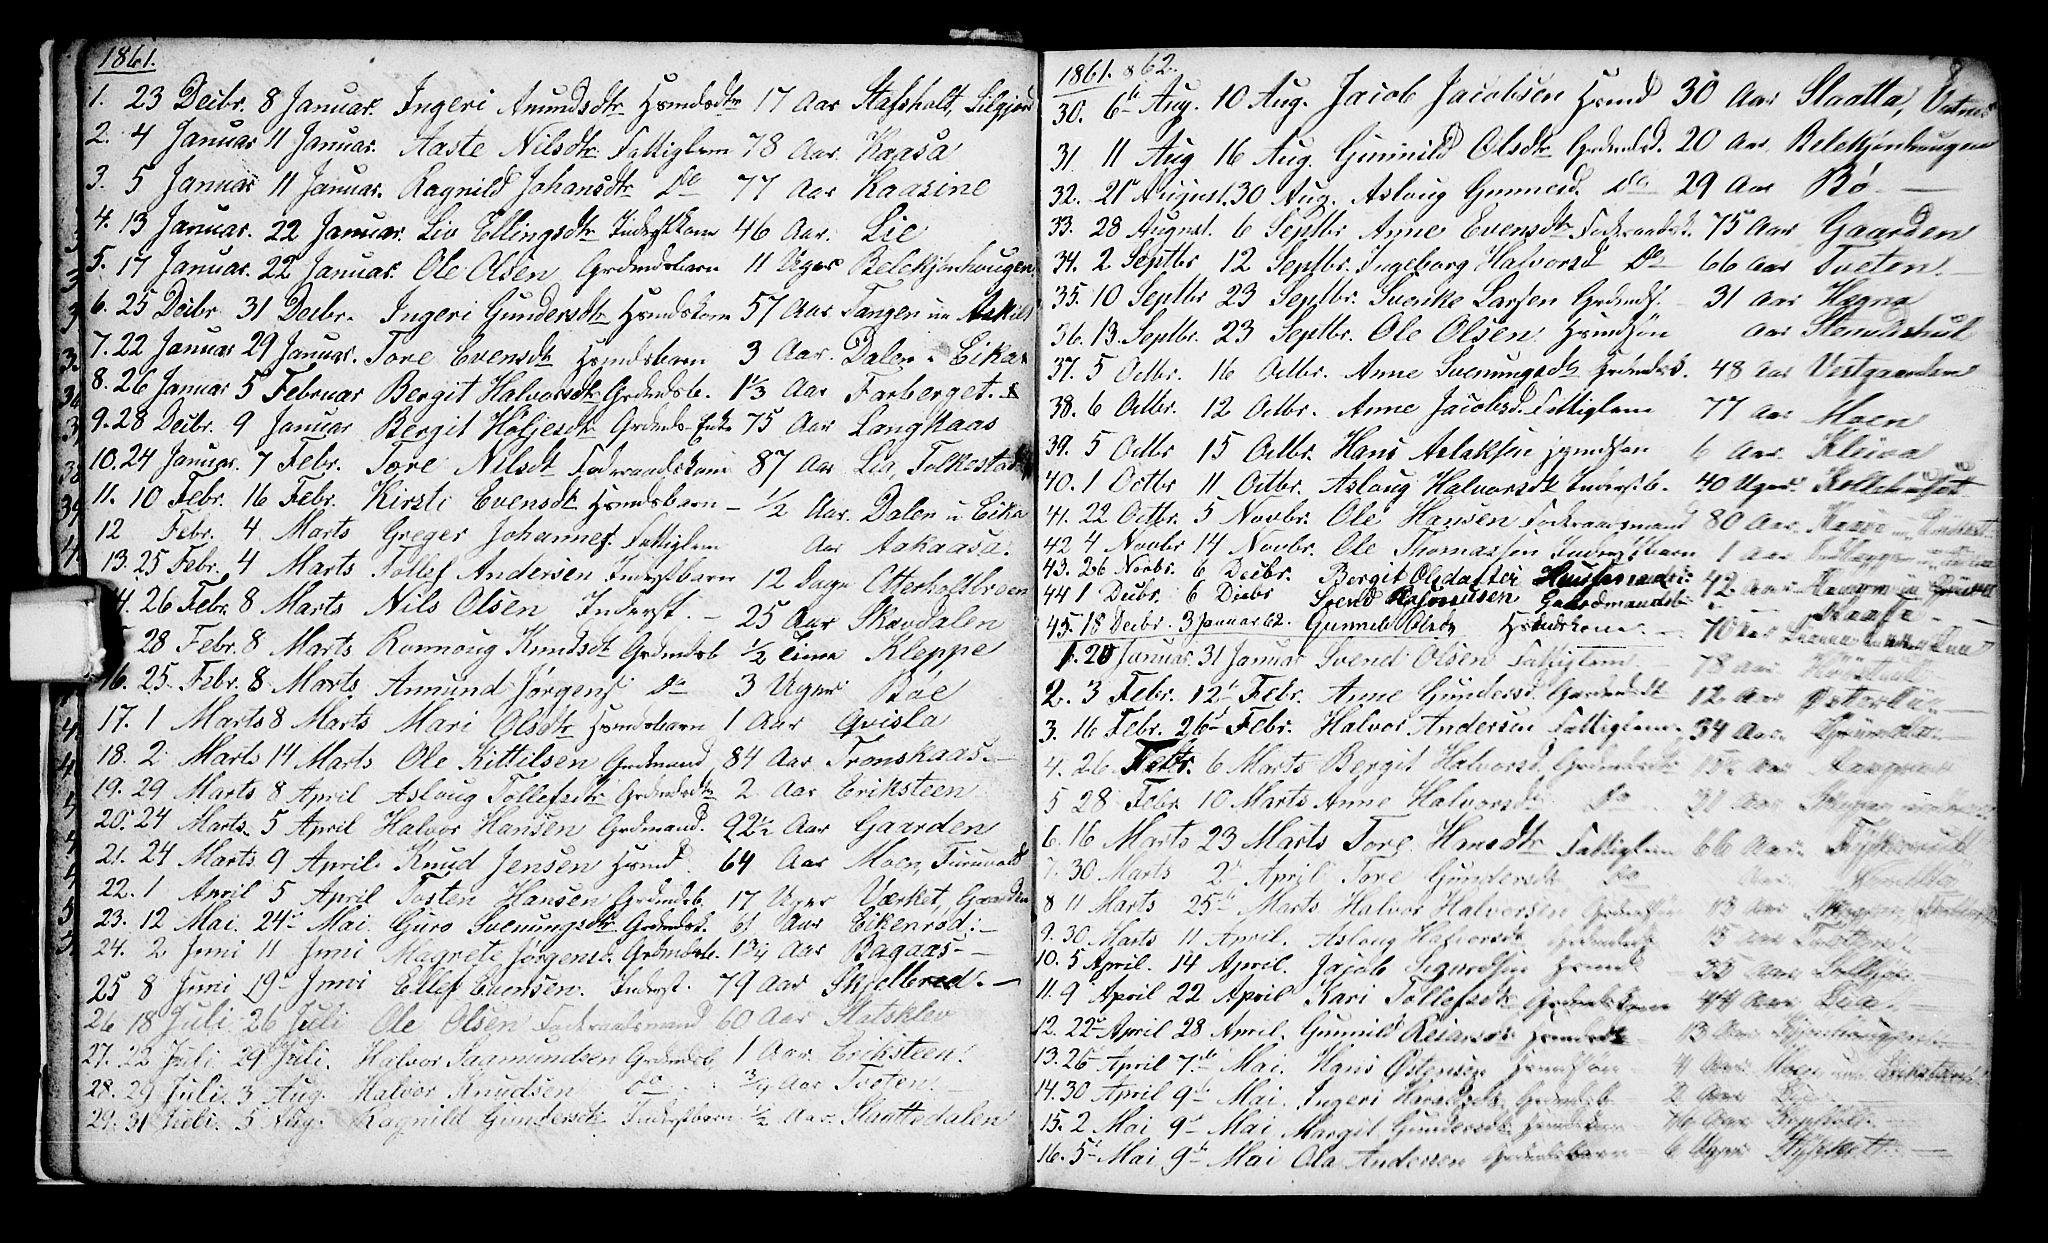 SAKO, Bø kirkebøker, G/Ga/L0002: Klokkerbok nr. 2, 1853-1866, s. 8